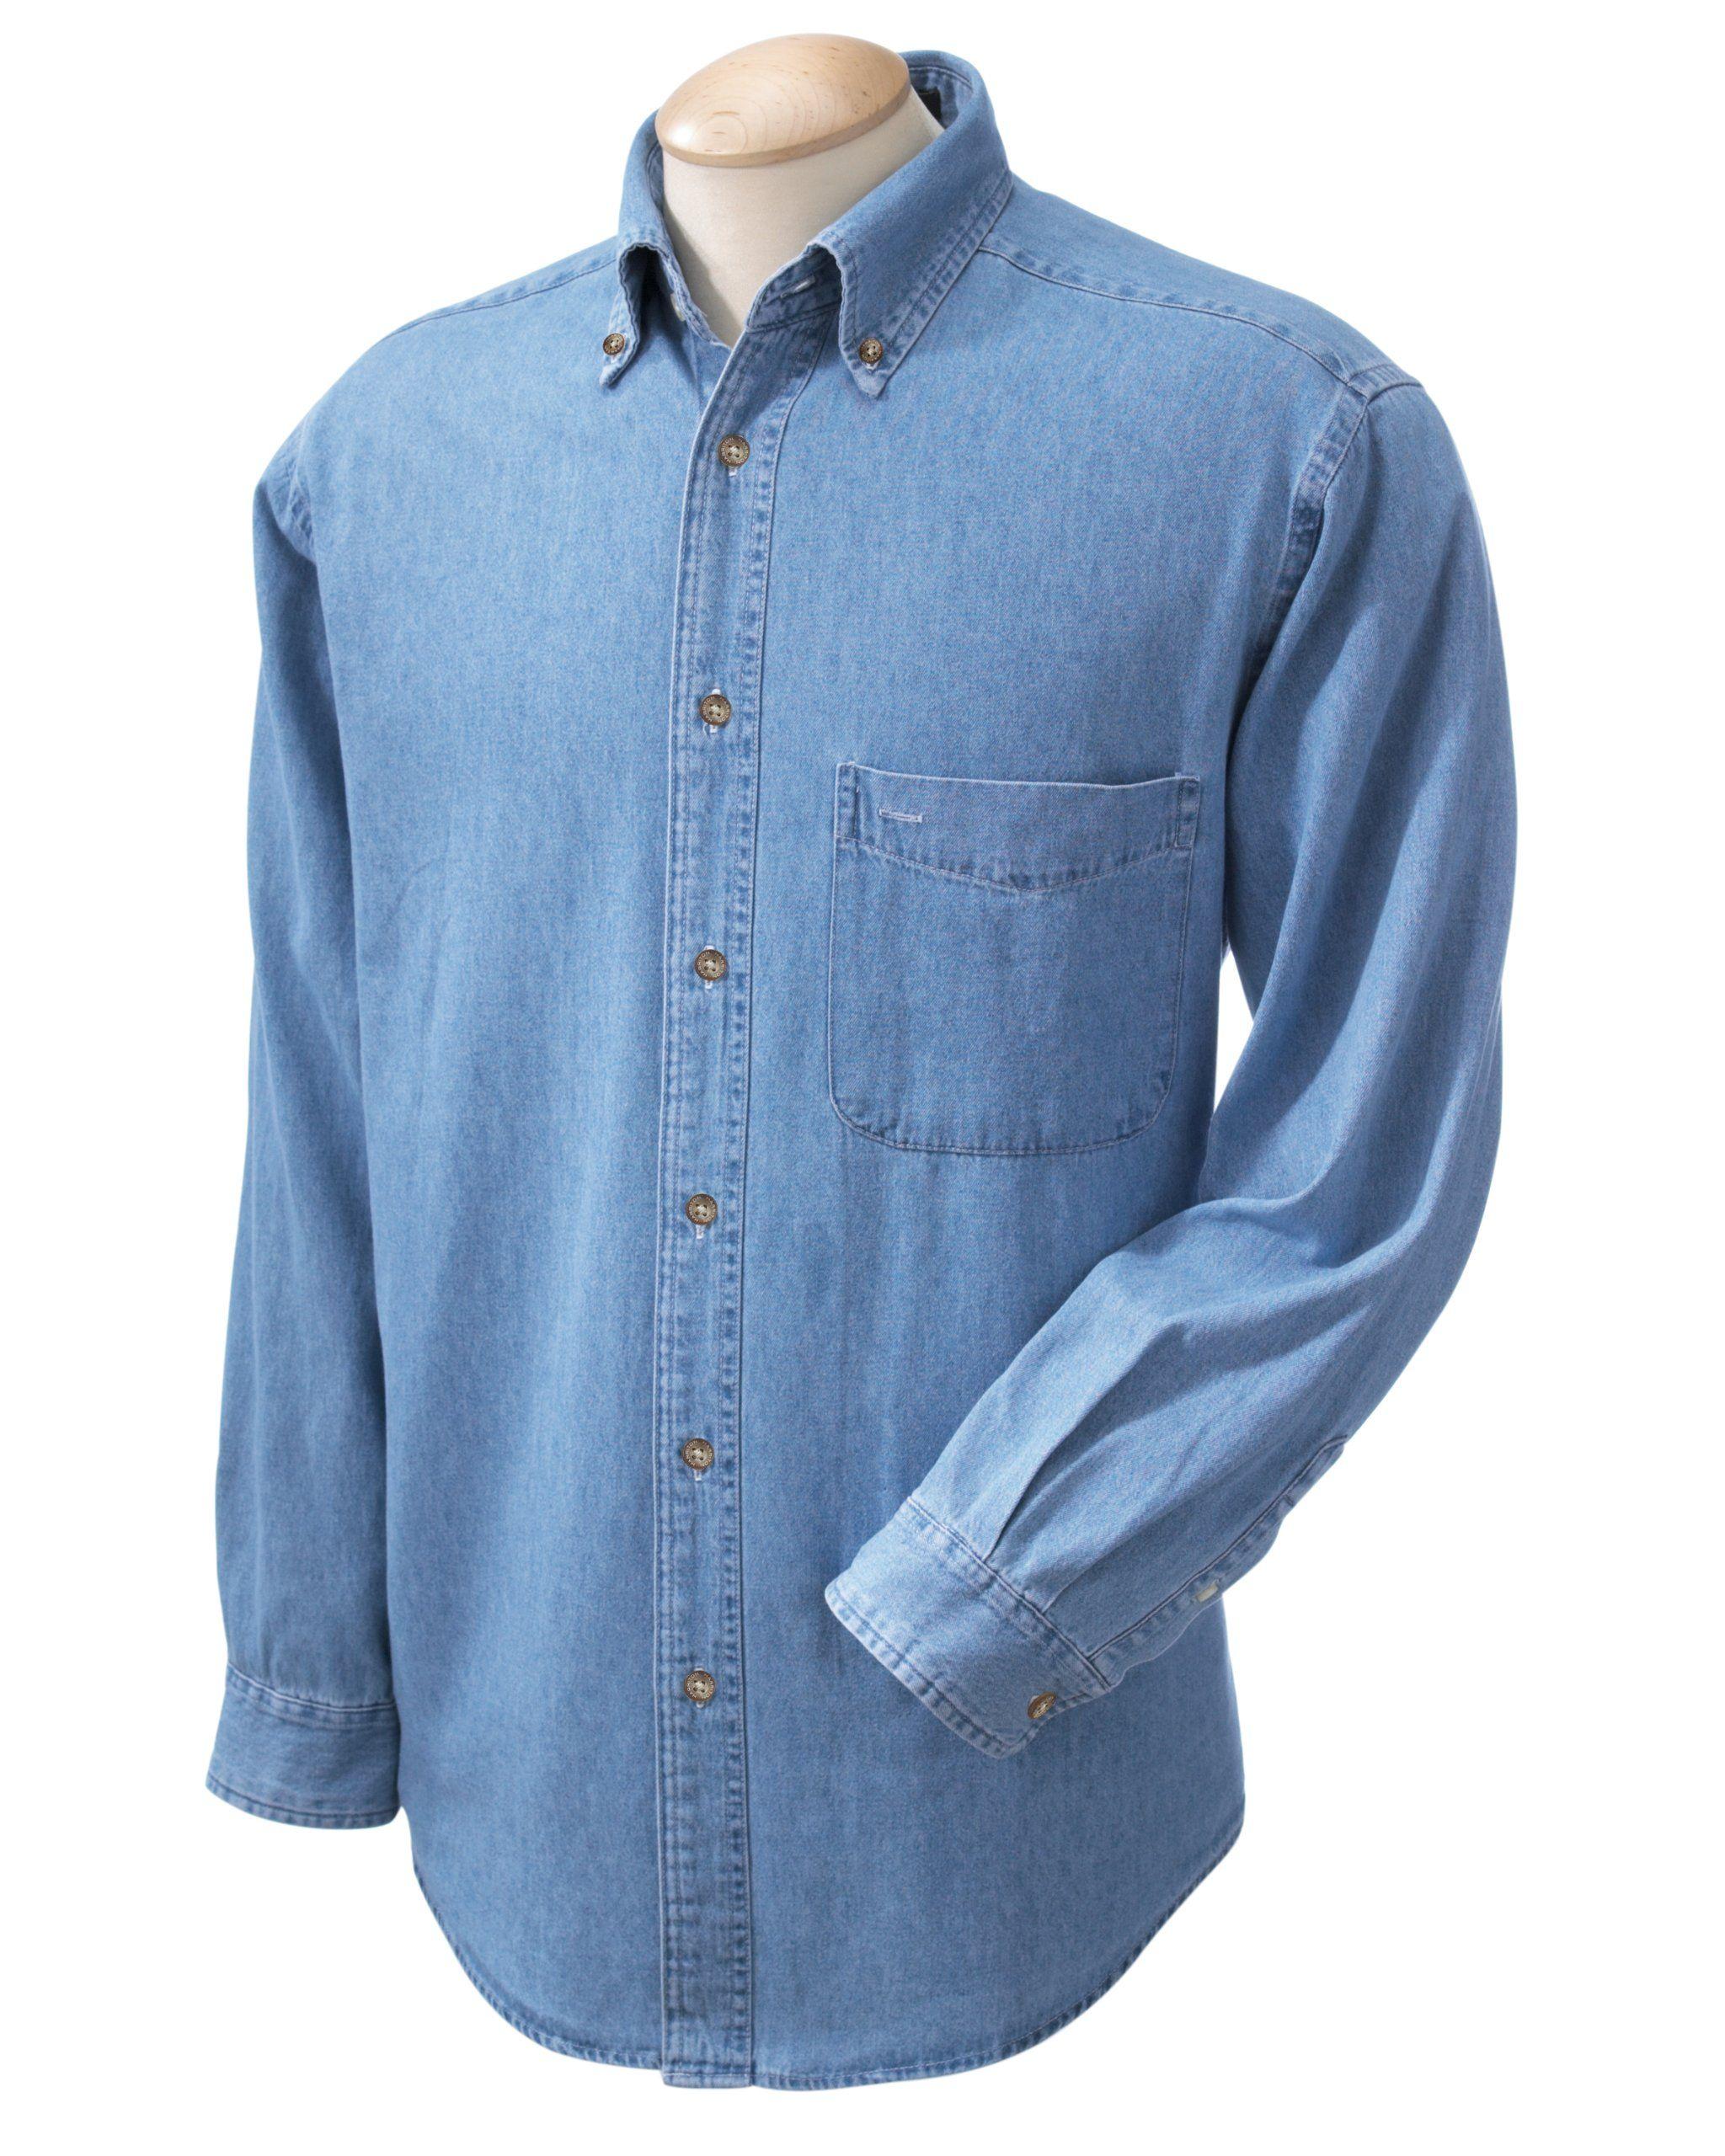 534867d9bc6 Harriton Men s 6.5 oz. Long-Sleeve Denim Shirt - LIGHT DENIM - S M550-simple